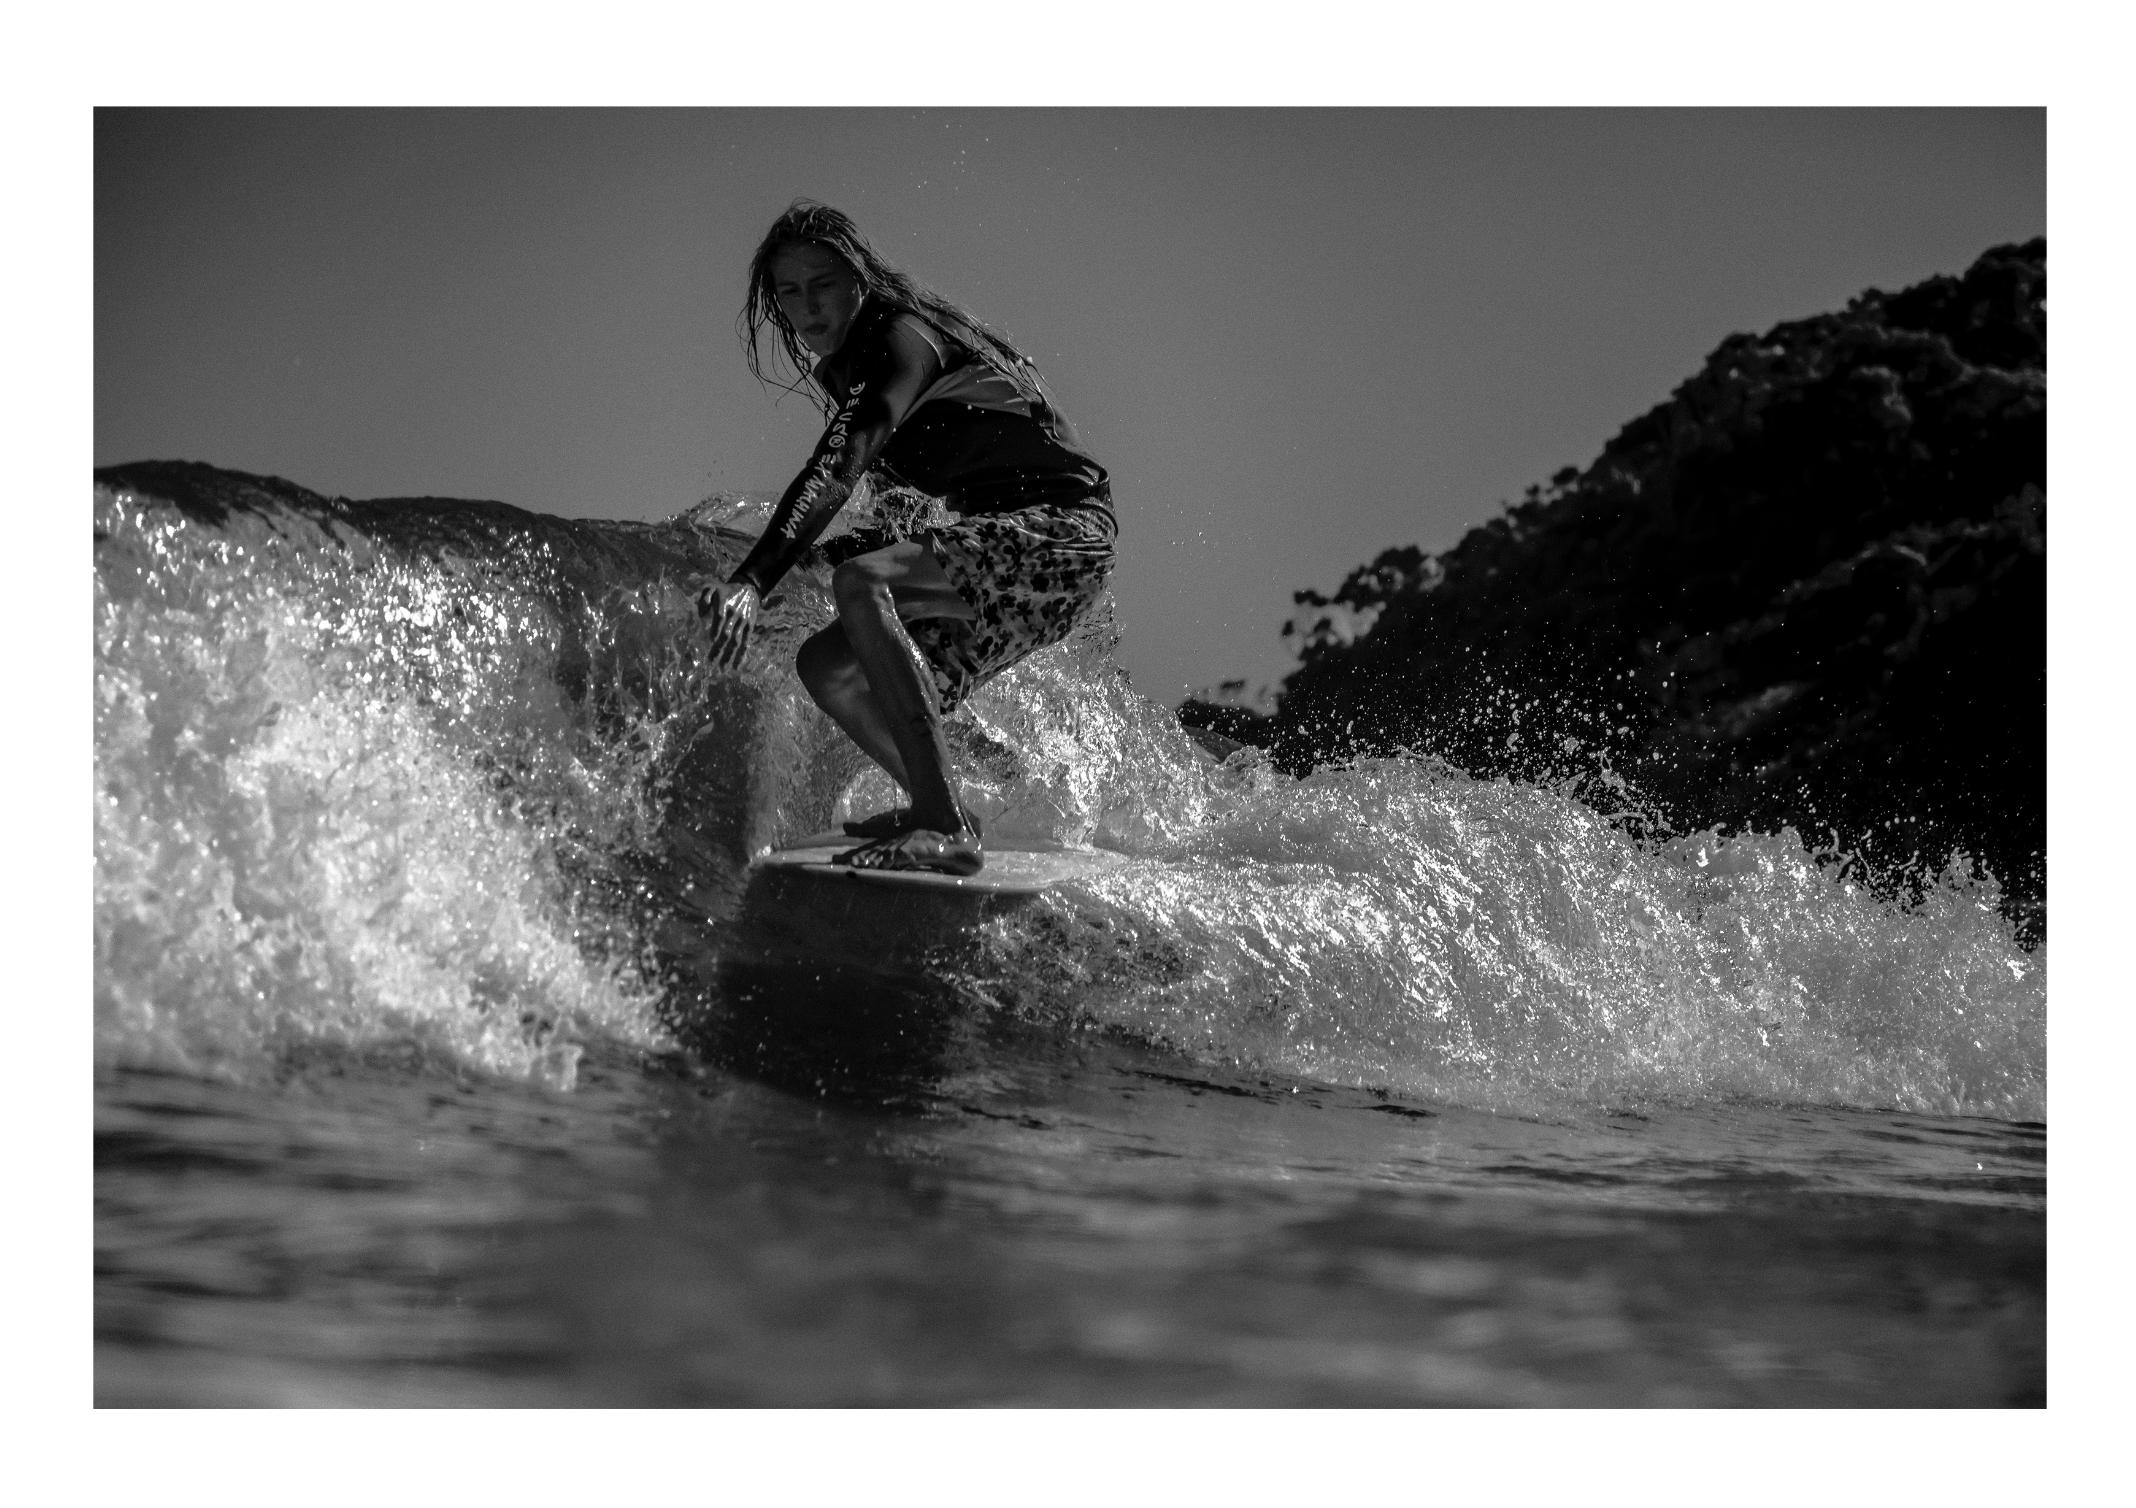 Fabien_voileau_salt_water_byron_bay_surf_Jye_whyatt_15